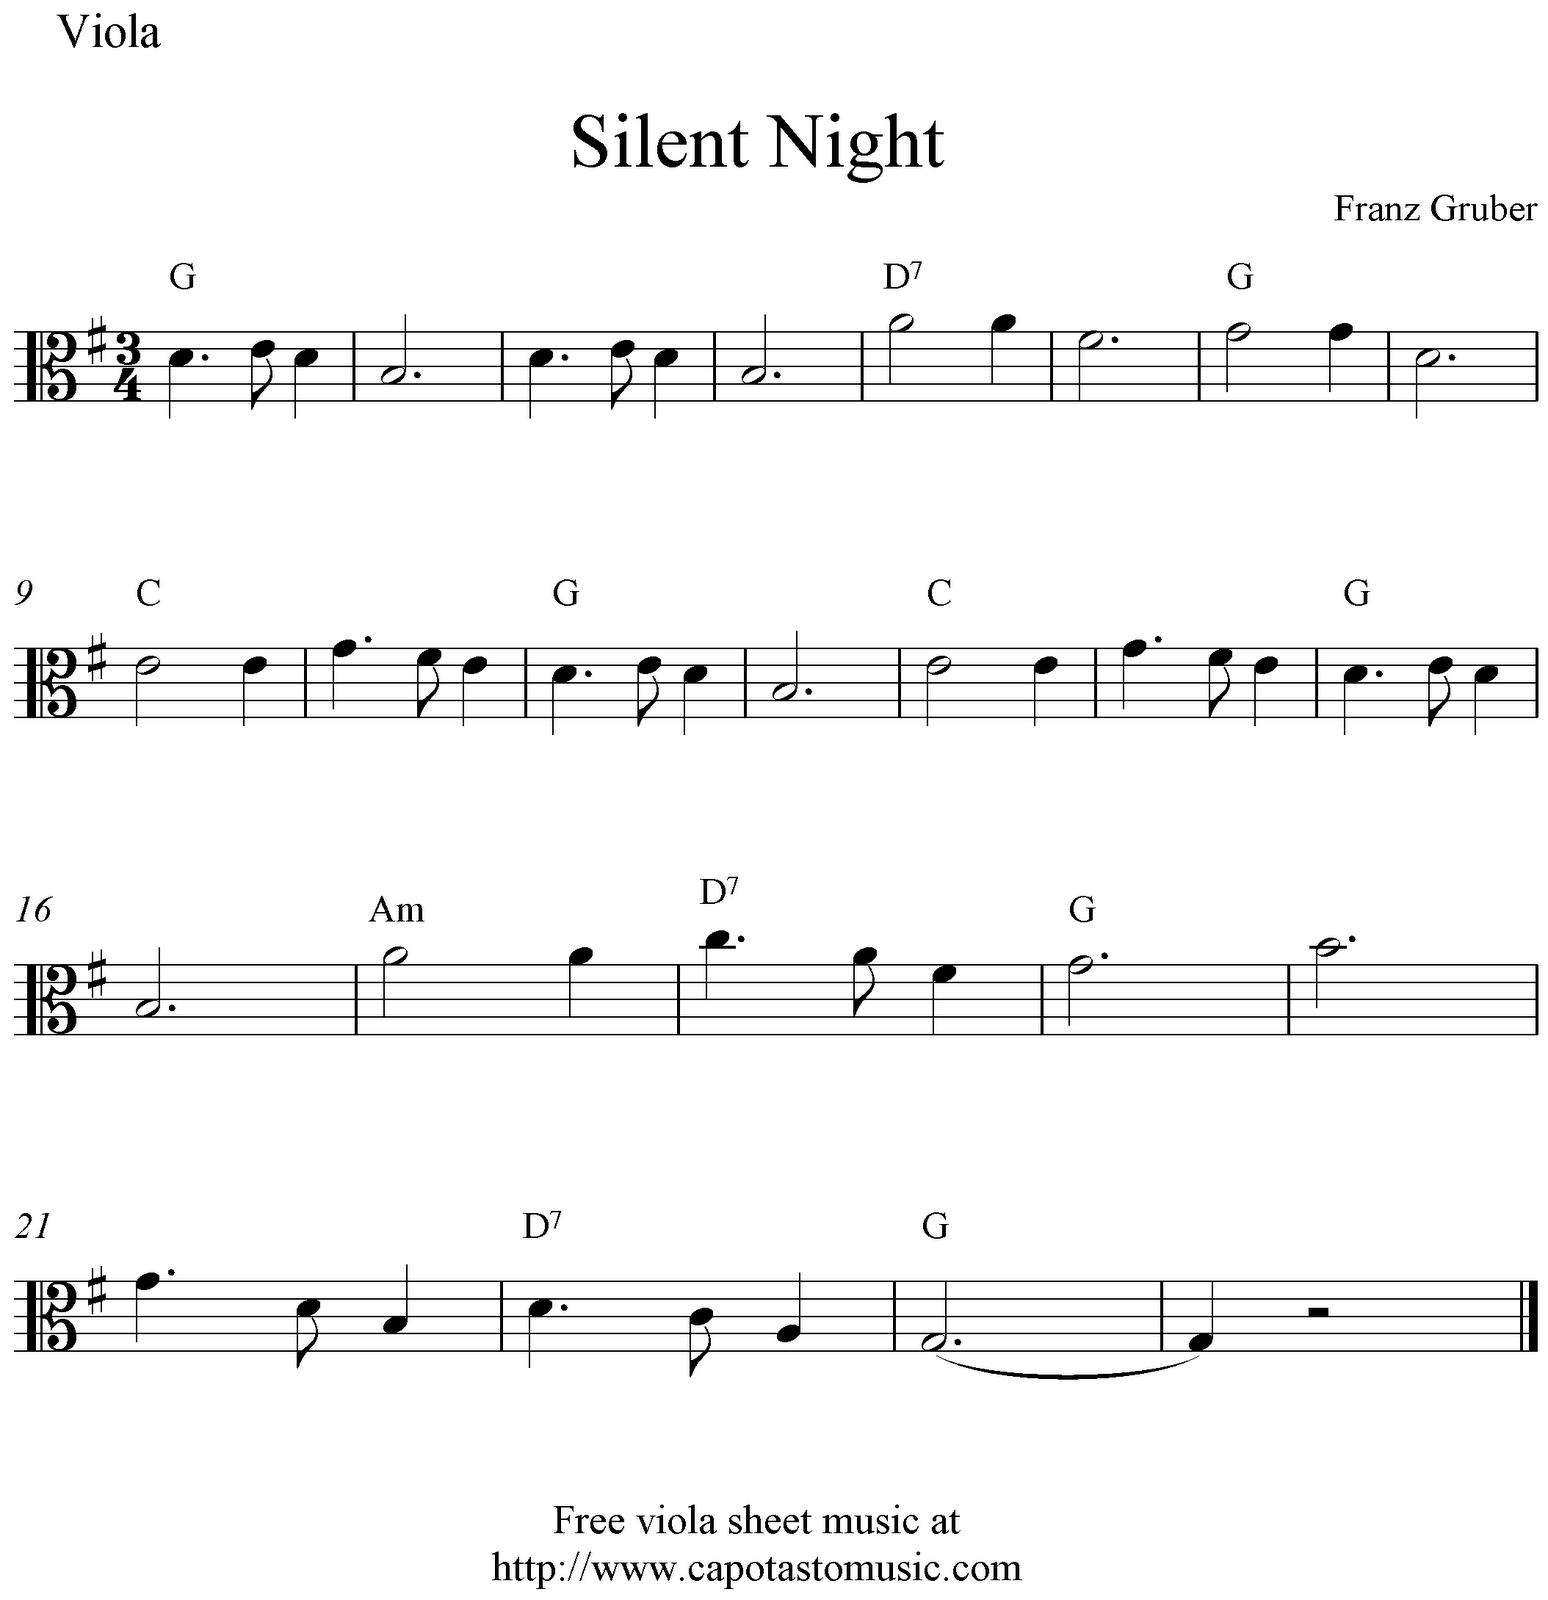 Free Christmas Violin Sheet Music O: Free Viola Sheet Music, Silent Night